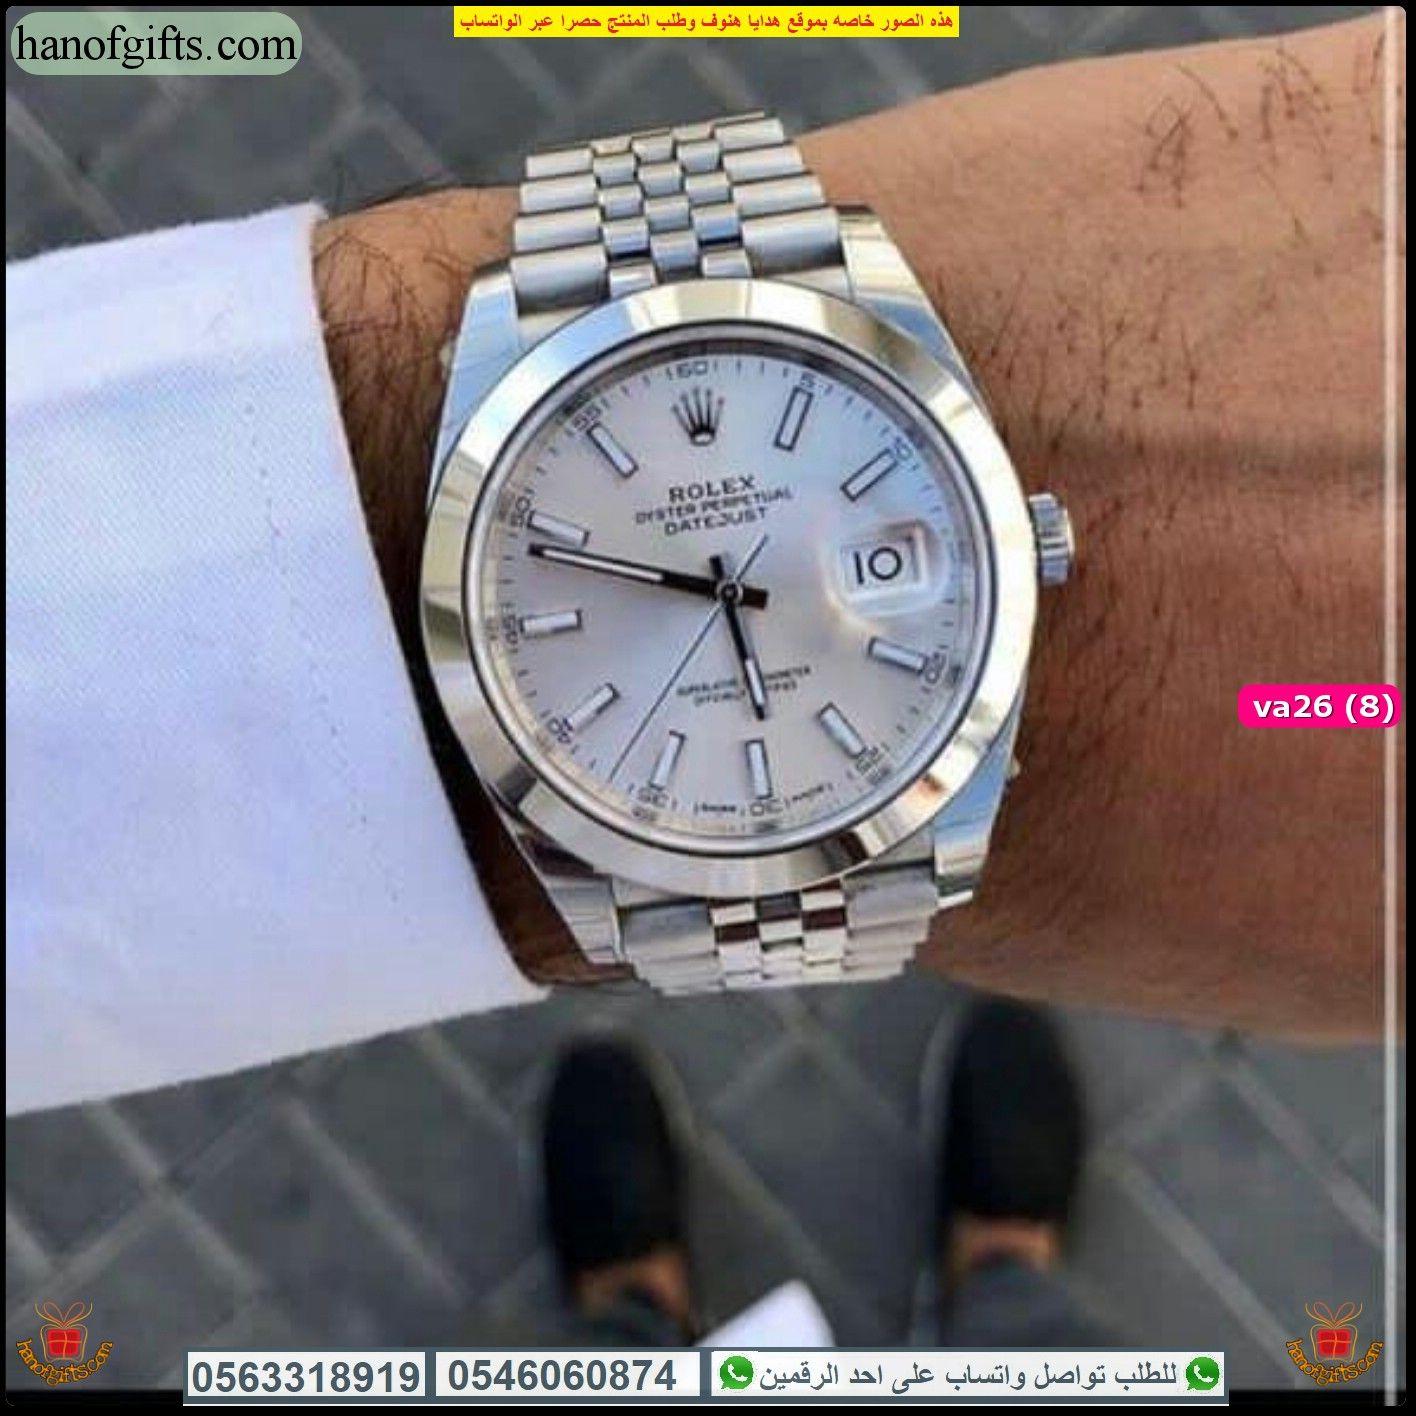 ساعات رولكس كلاسيك رجالي Rolex بقفل عريض مع الملحقات هدايا هنوف Silver Watch Accessories Silver